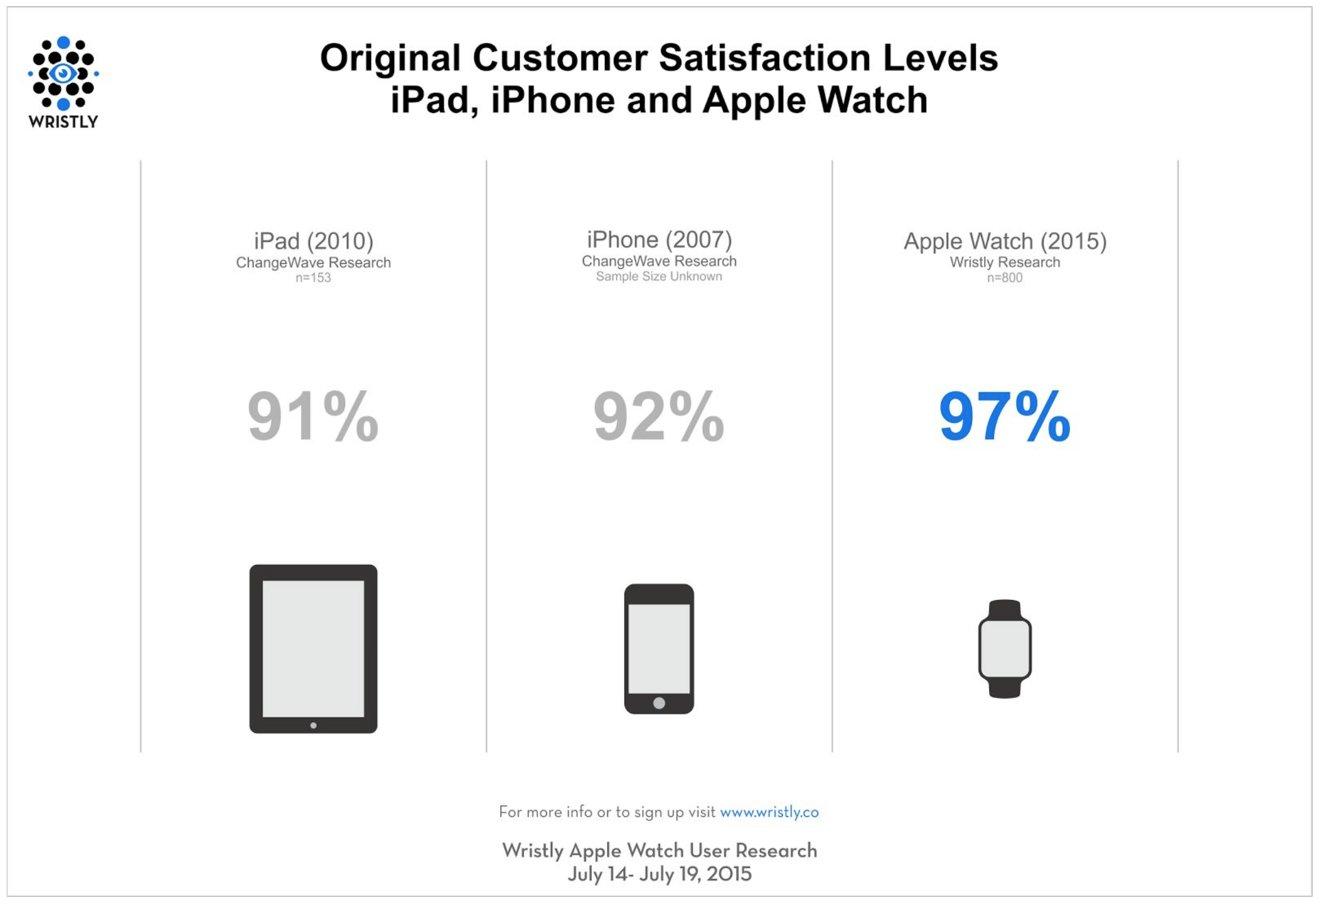 Apple Watch 97% customer sat